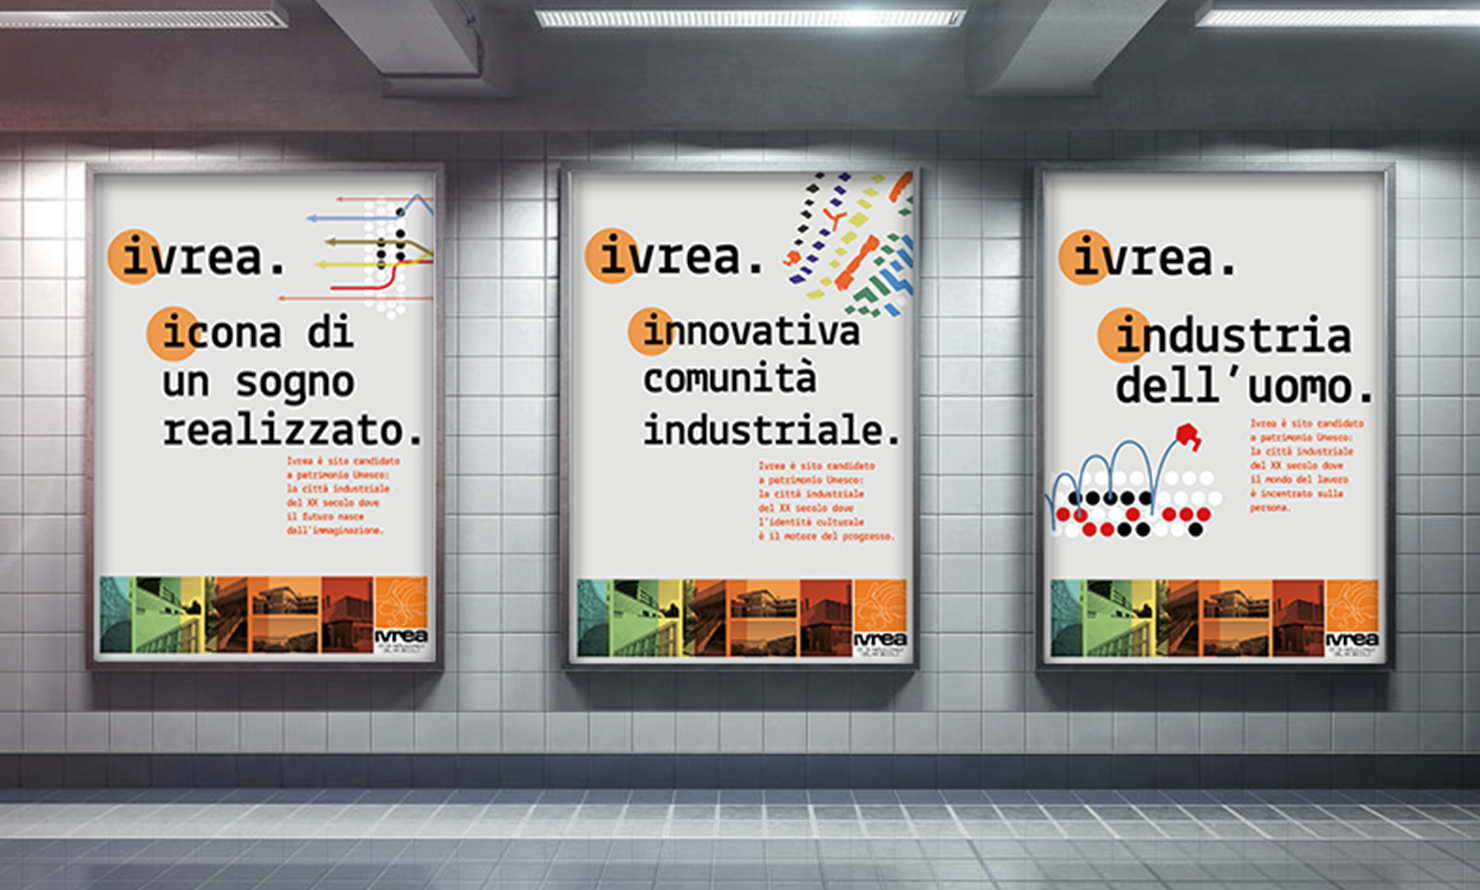 https://kubelibre.com/uploads/Slider-work-tutti-clienti/ivrea-e-unesco-città-industriale-del-xx-secolo-6.jpg